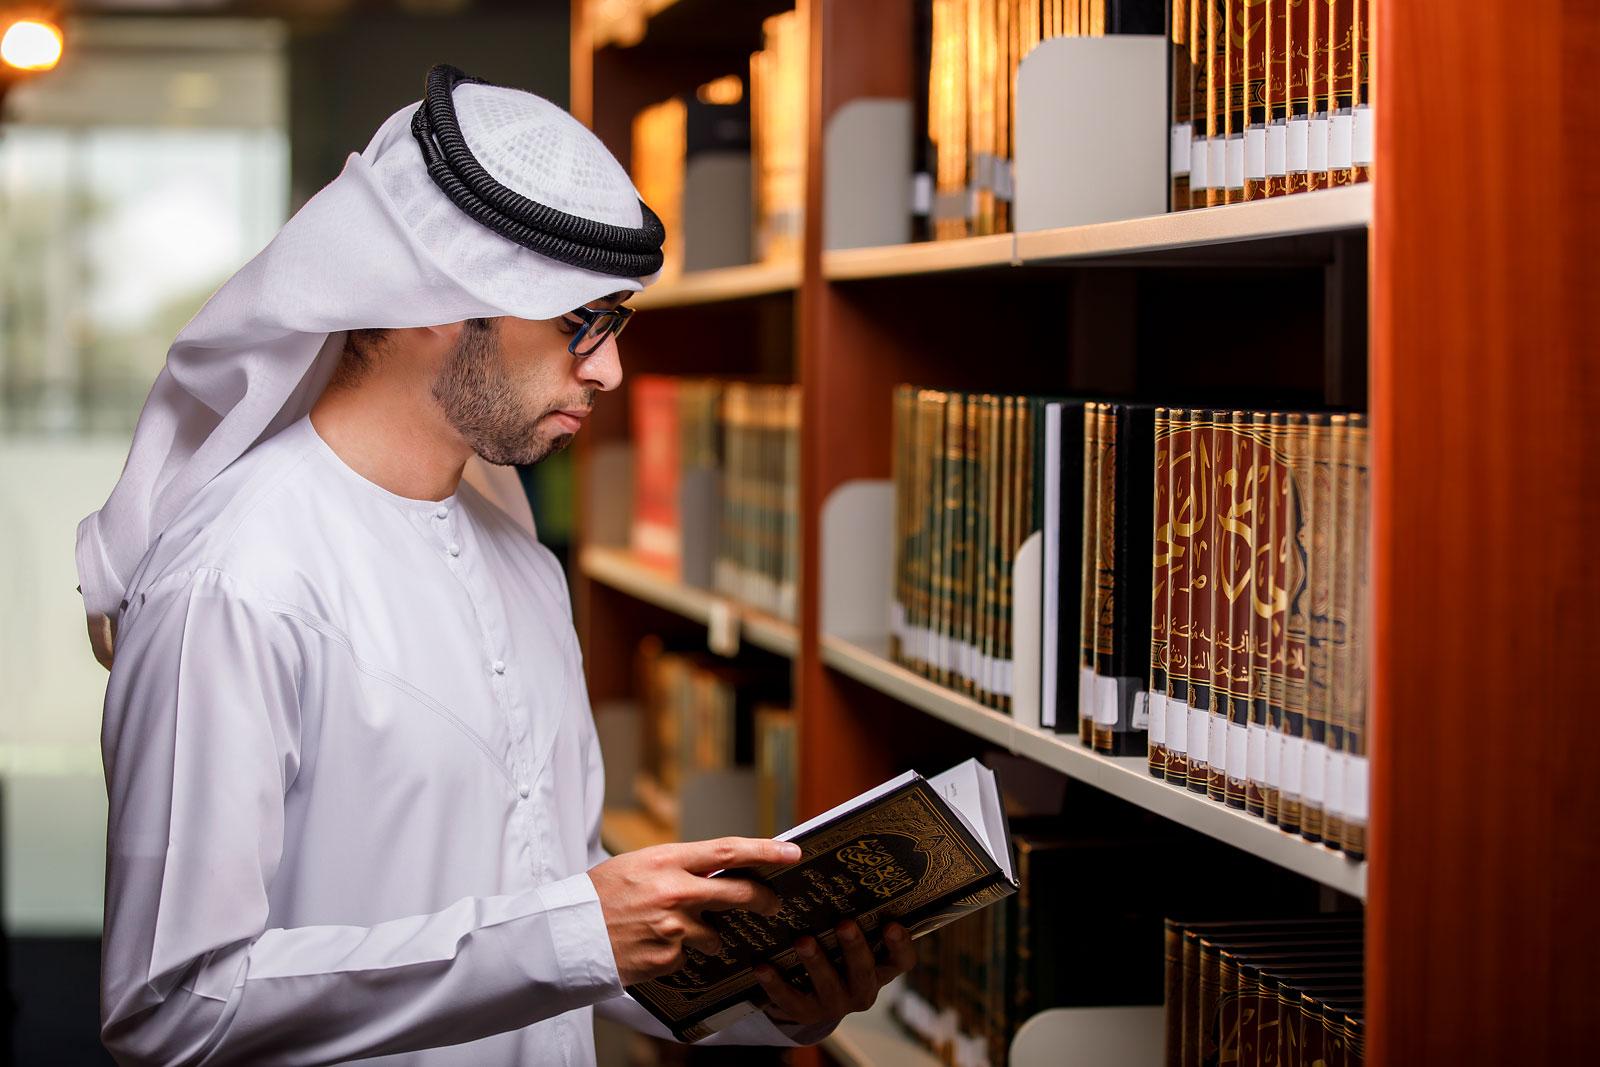 Master of Islamic Studies Program : Jurisprudence of Reality